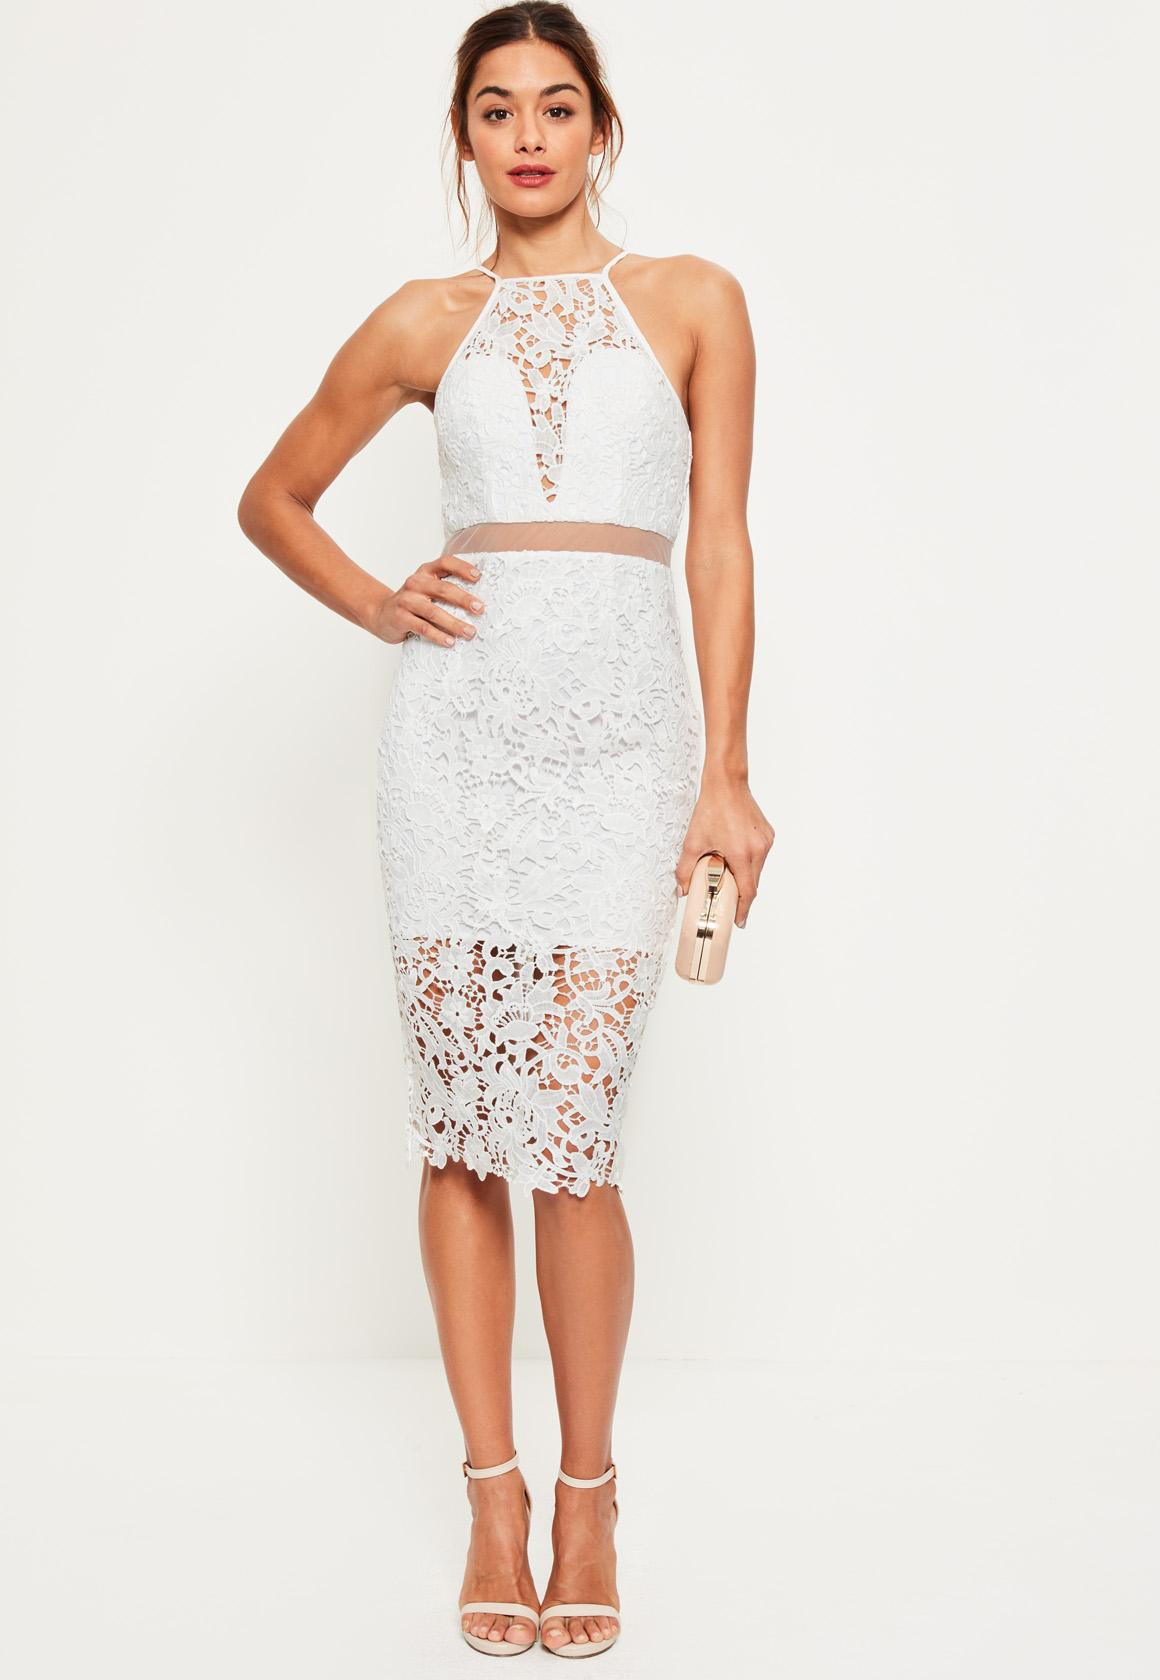 Lace dress petite 2 dresses